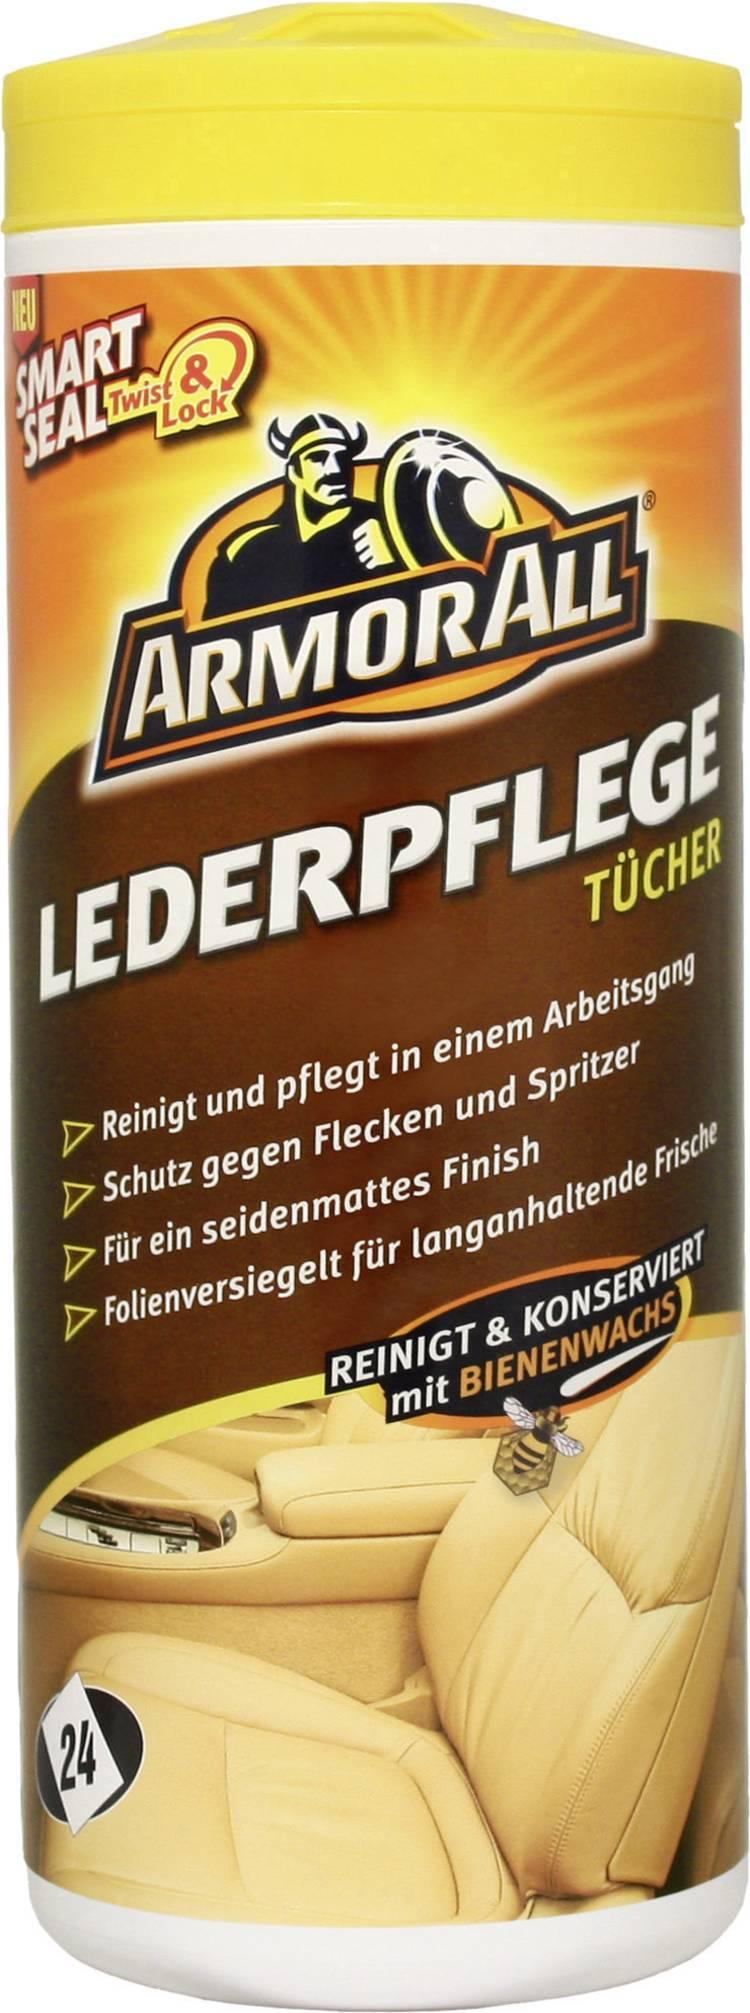 ArmorAll 39020L 24 stuks